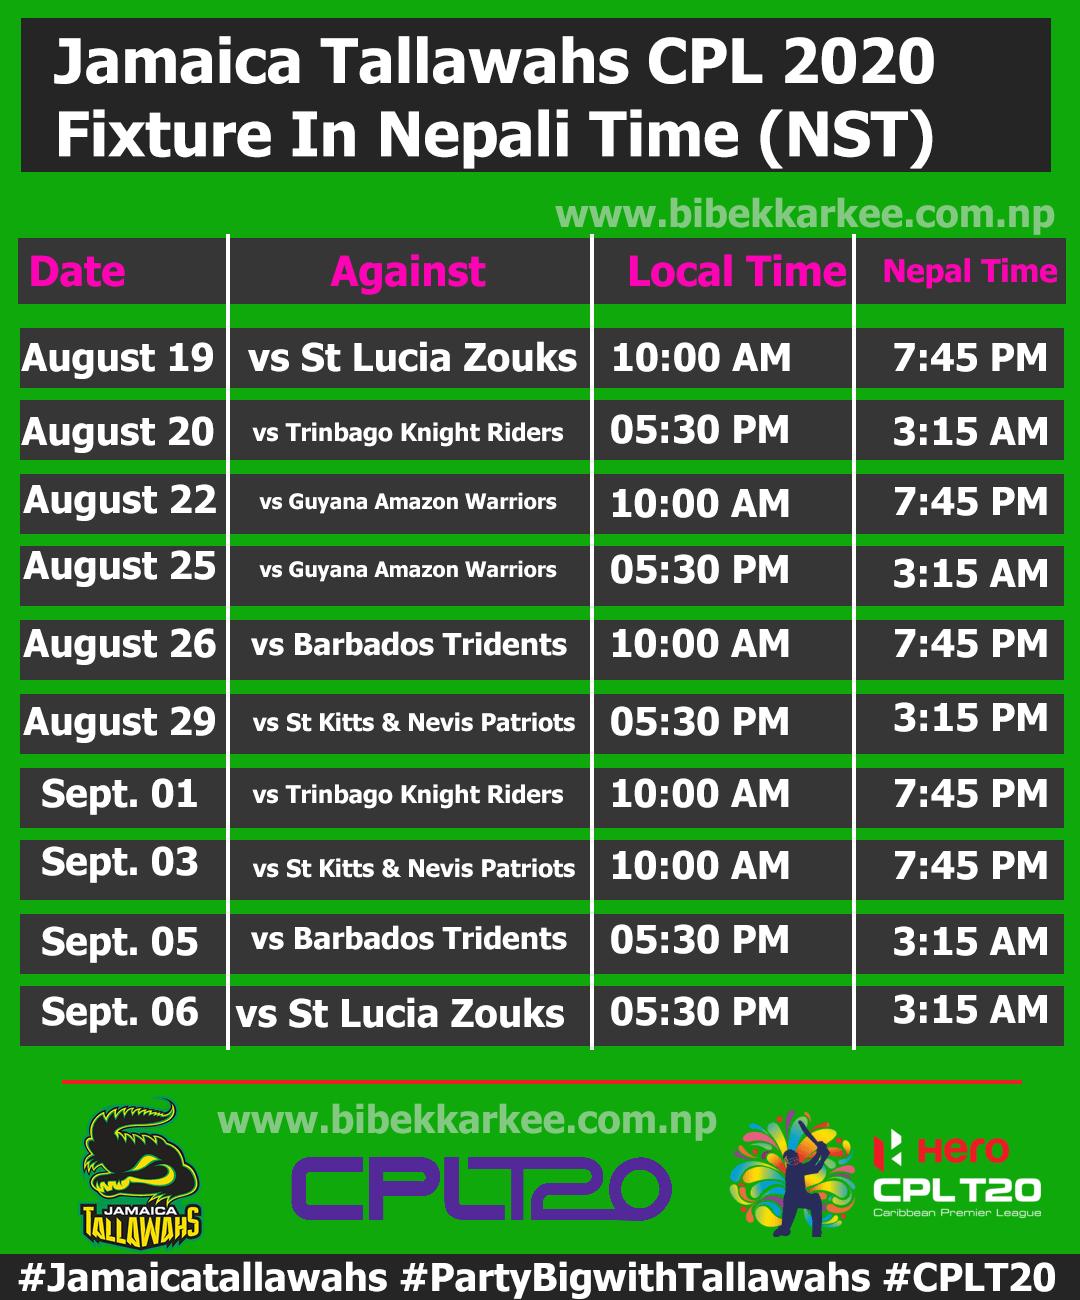 Jamaica Tallawahs CPL 2020 Full Match Schedule in Nepali Time, CPL Fixture in nepali time, Sandeep Lamichhane in cpl 2020, Sandeep lamichhane match time in nepali time, sandeep lamichhane in cpl, cpl 2020 in nepali time,